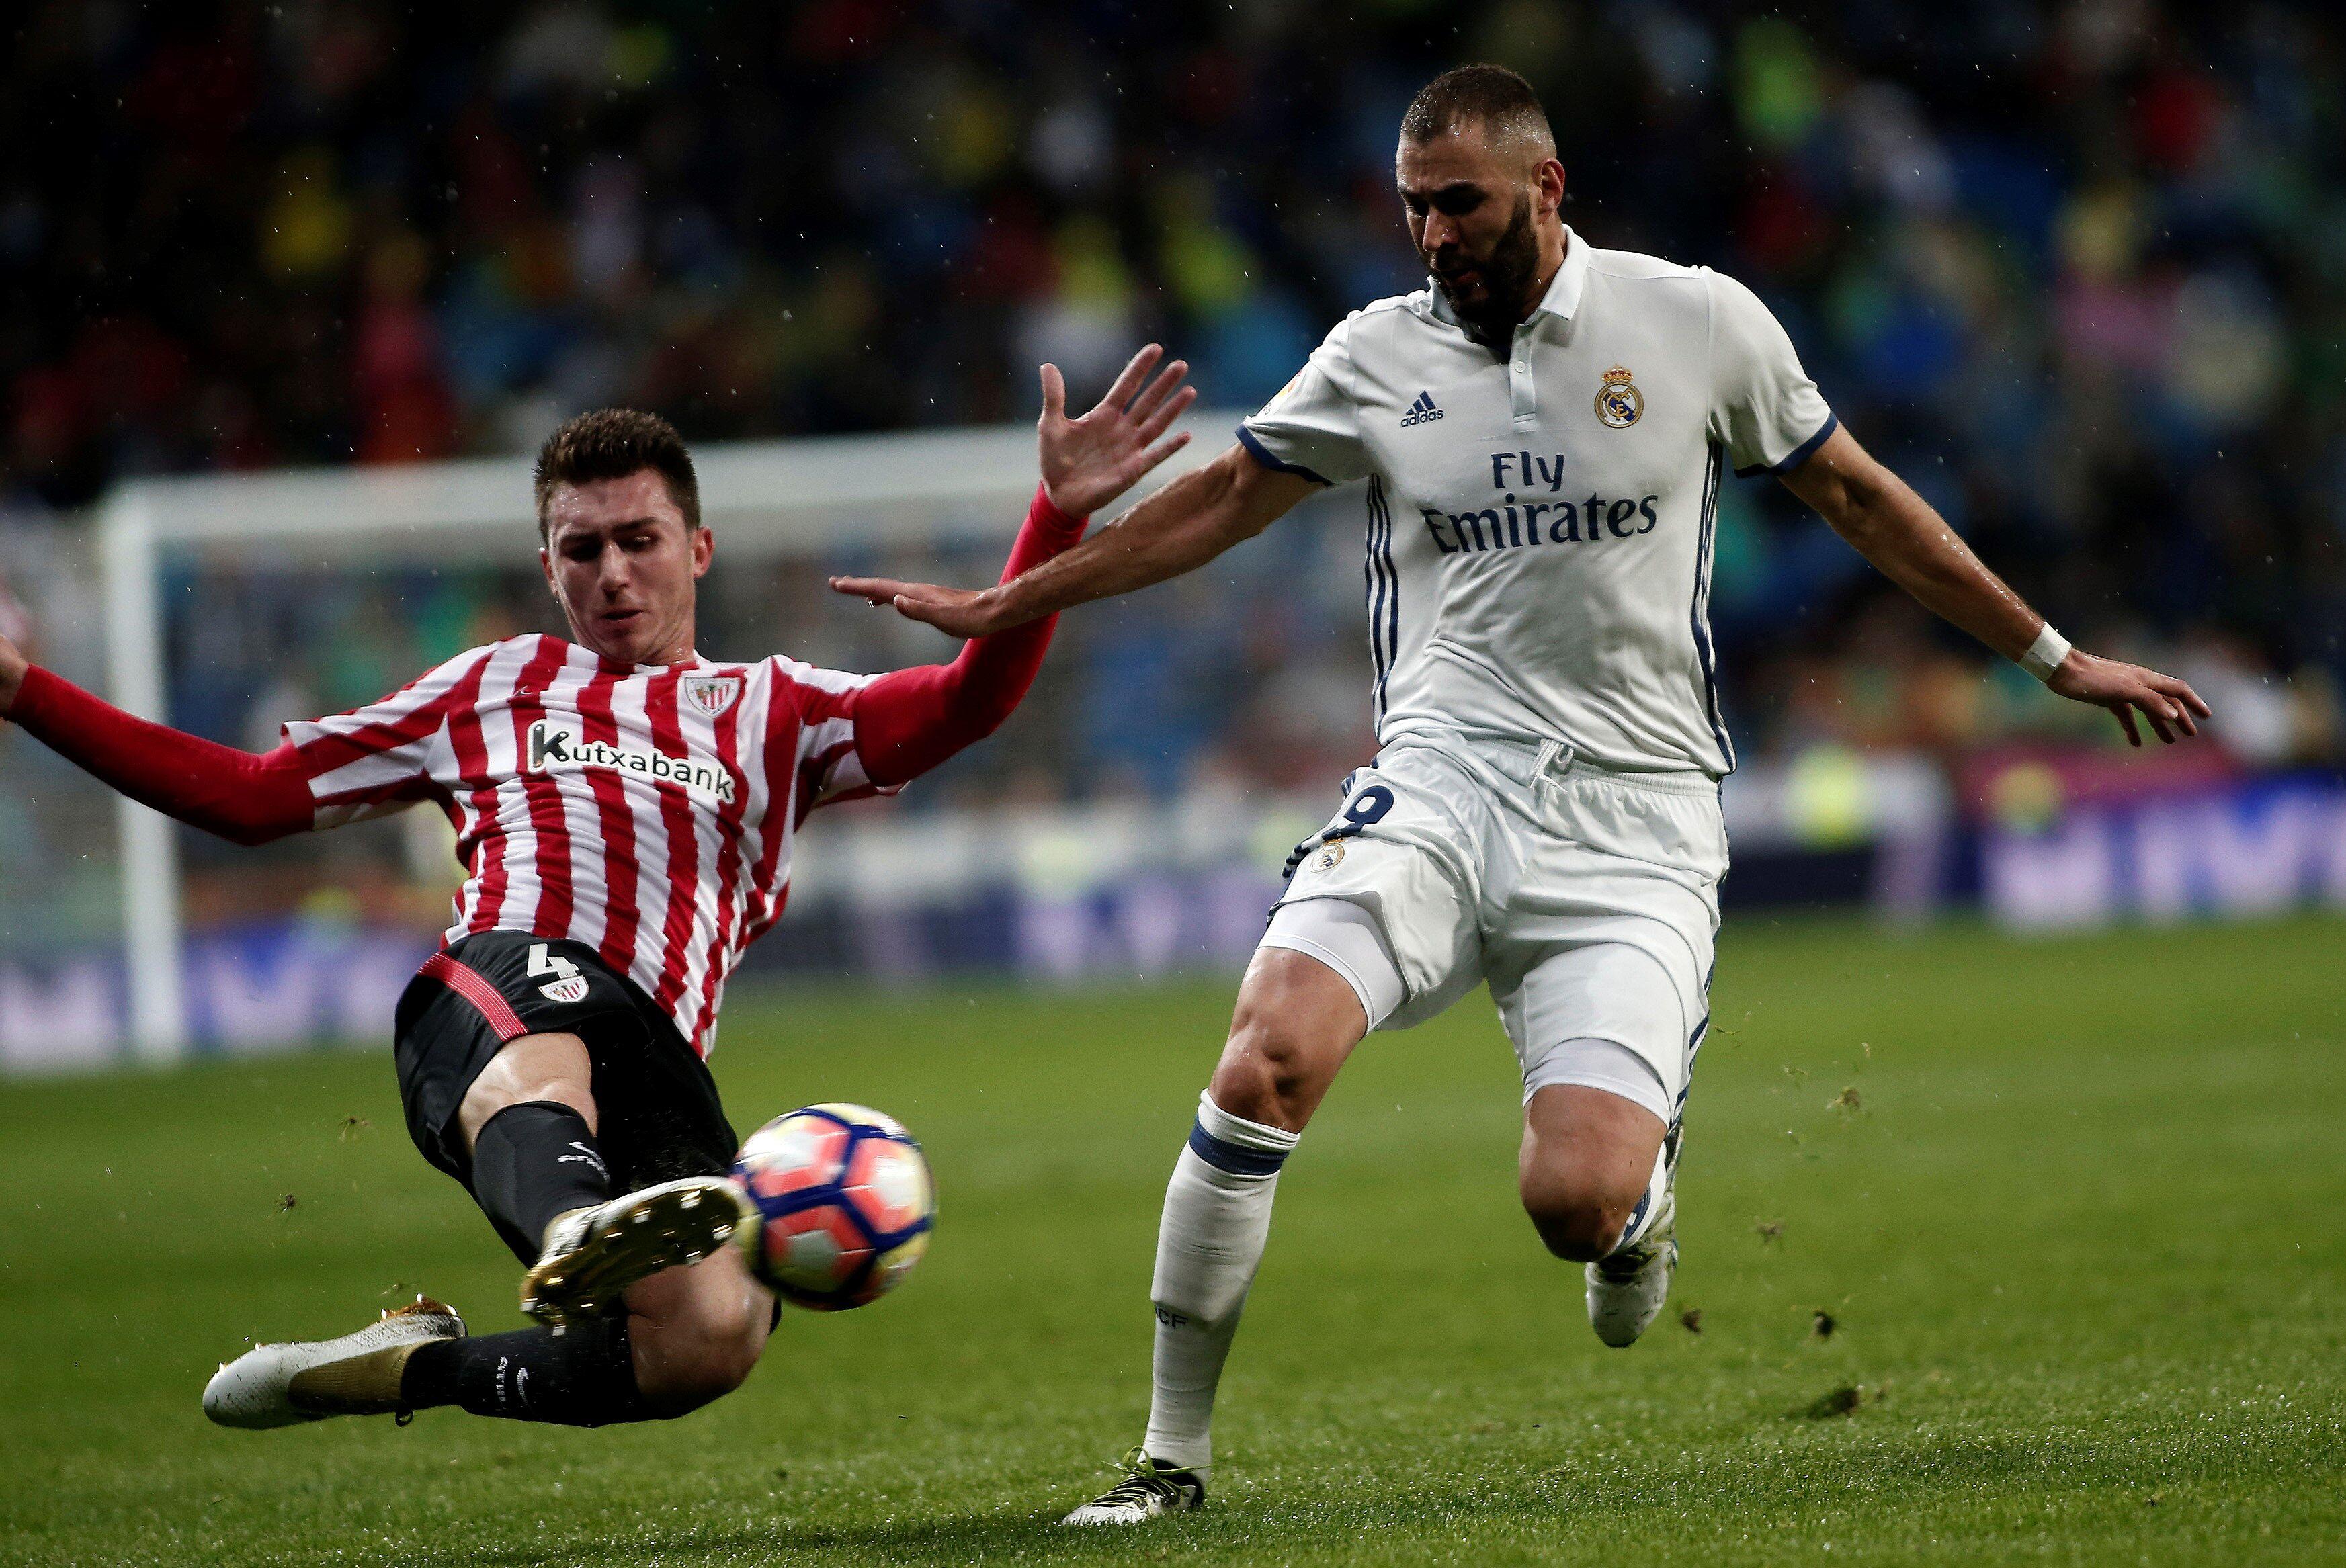 Real Madrid Athletic Bilbao